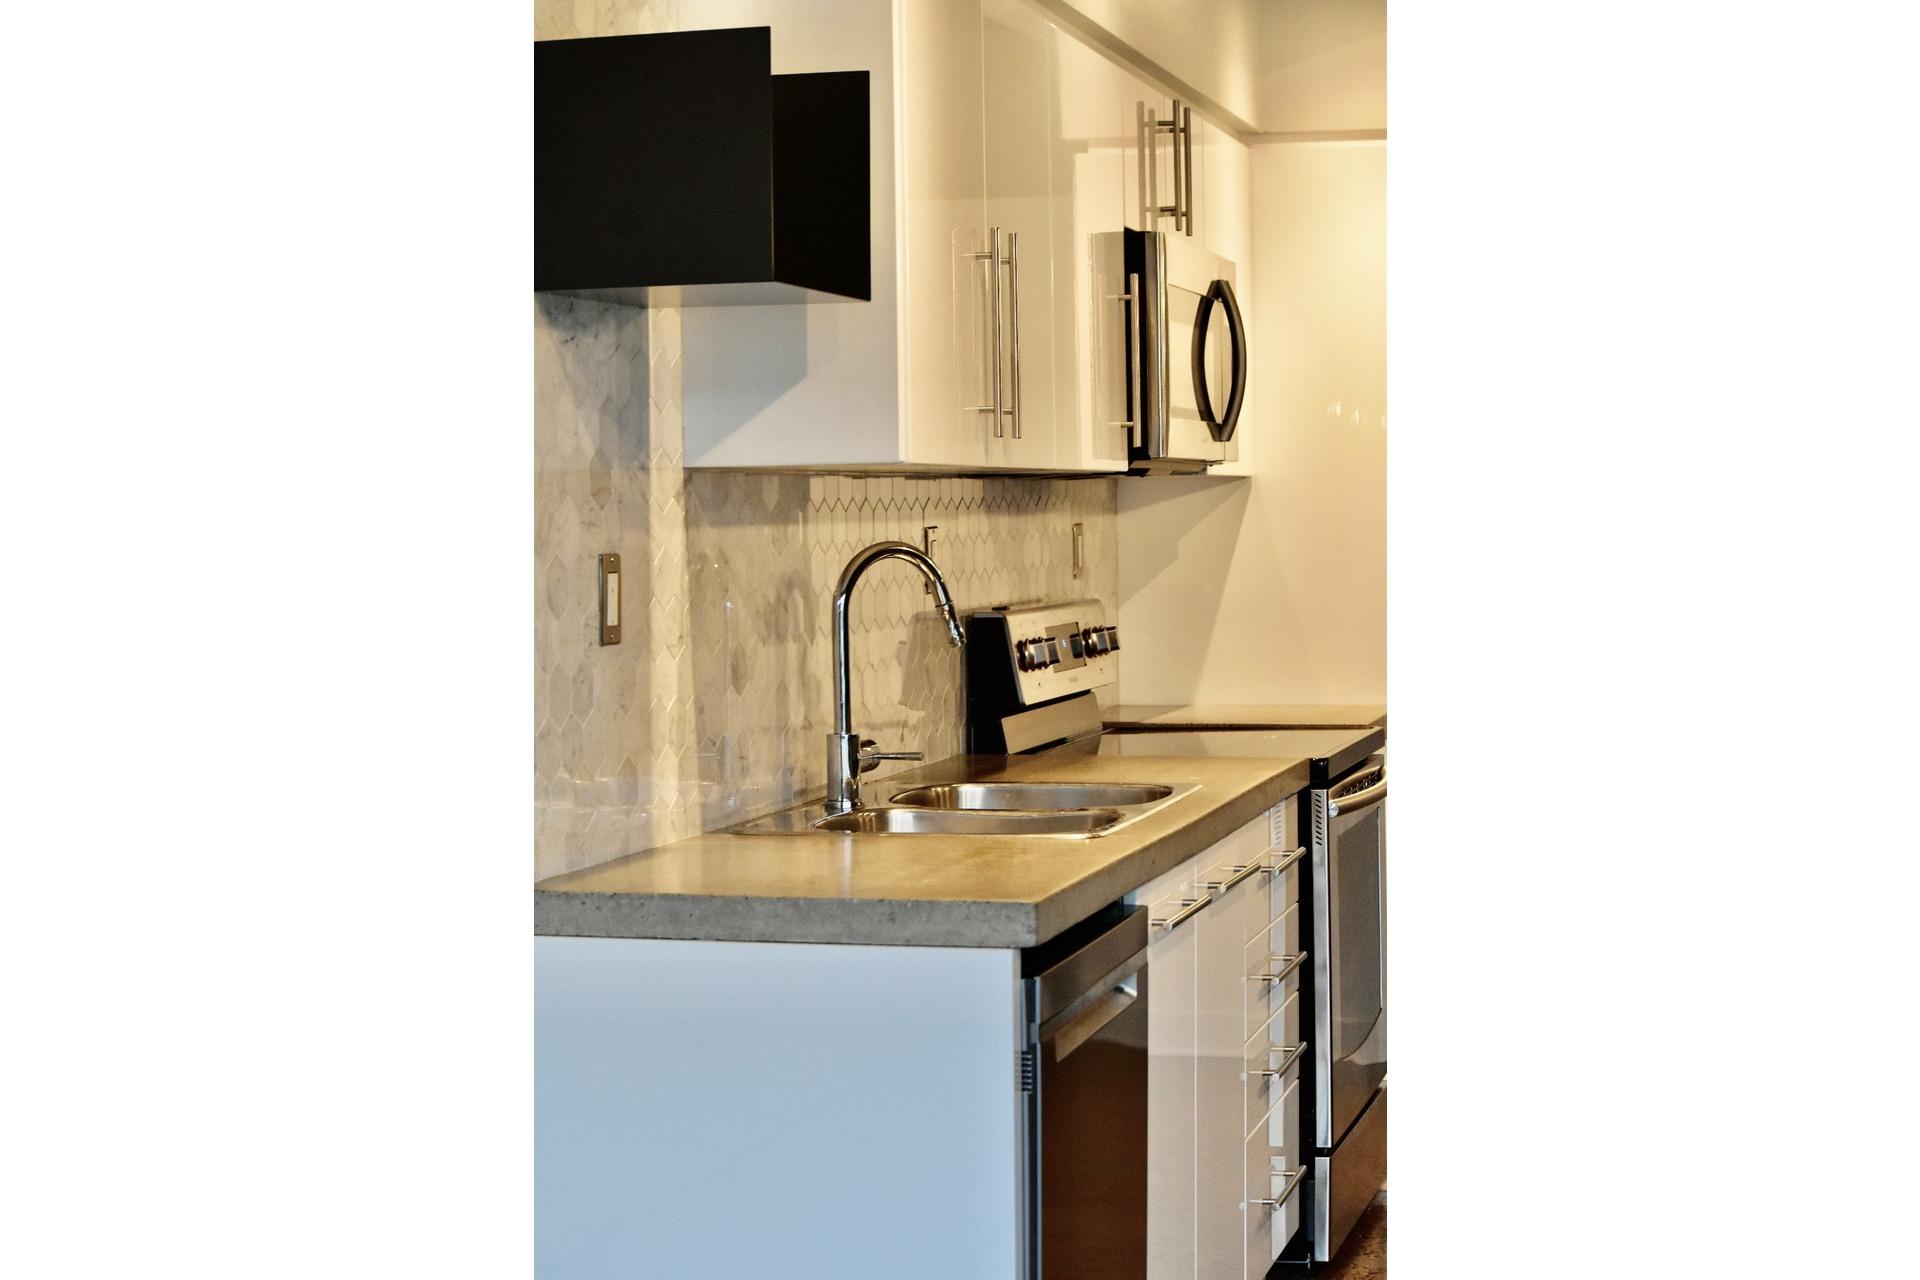 image 3 - Departamento Para alquiler Villeray/Saint-Michel/Parc-Extension Montréal  - 5 habitaciones